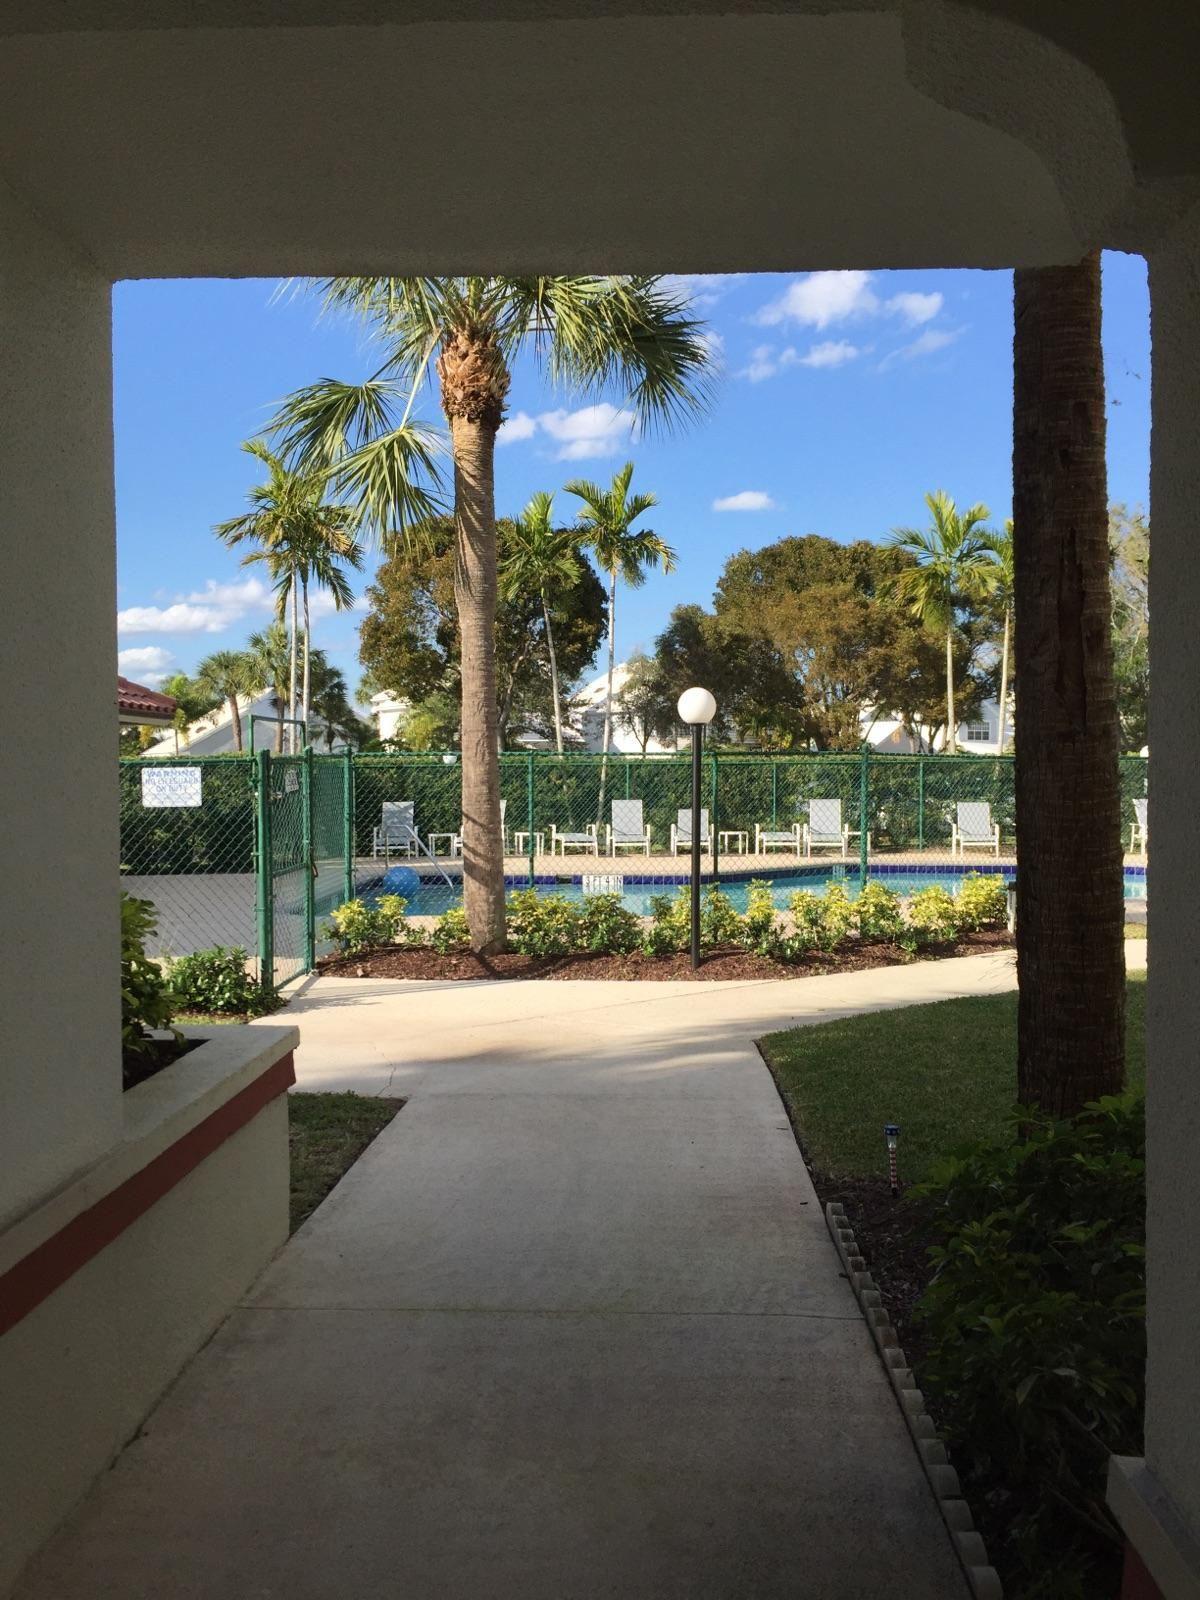 Photo of 116 Cypress Point Drive, Palm Beach Gardens, FL 33418 (MLS # RX-10620122)